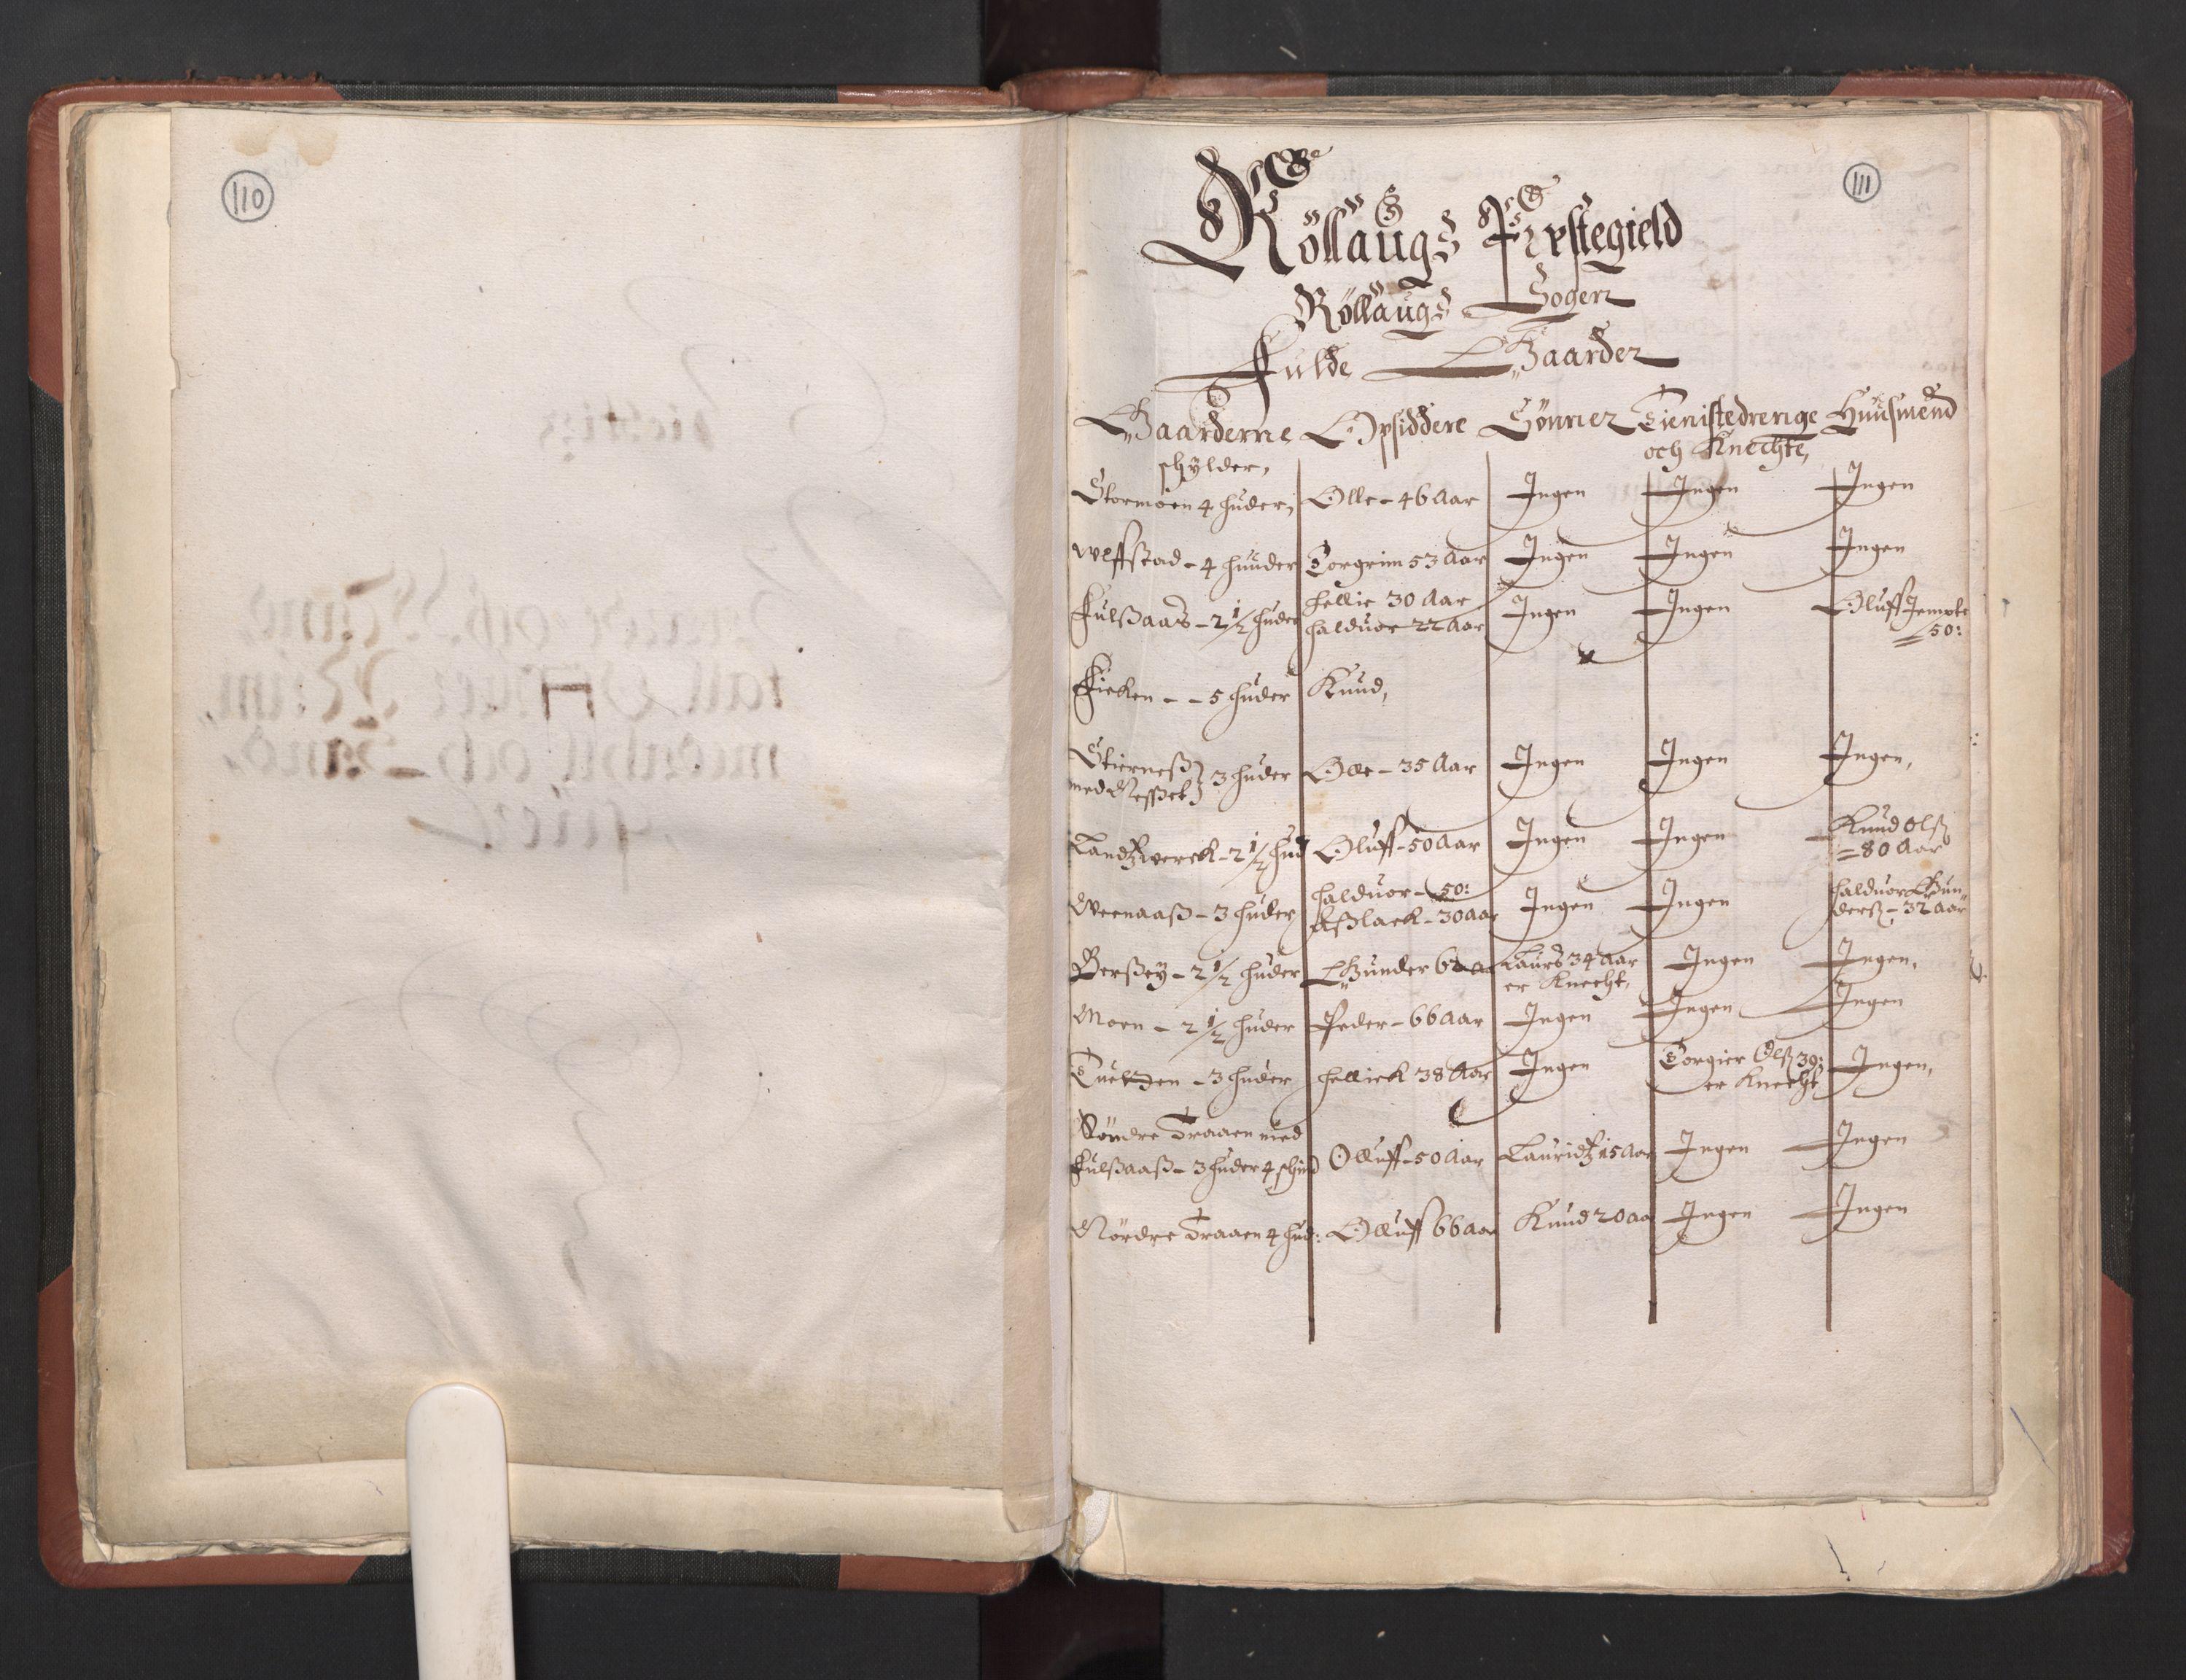 RA, Fogdenes og sorenskrivernes manntall 1664-1666, nr. 5: Fogderier (len og skipreider) i nåværende Buskerud fylke og Vestfold fylke, 1664, s. 110-111